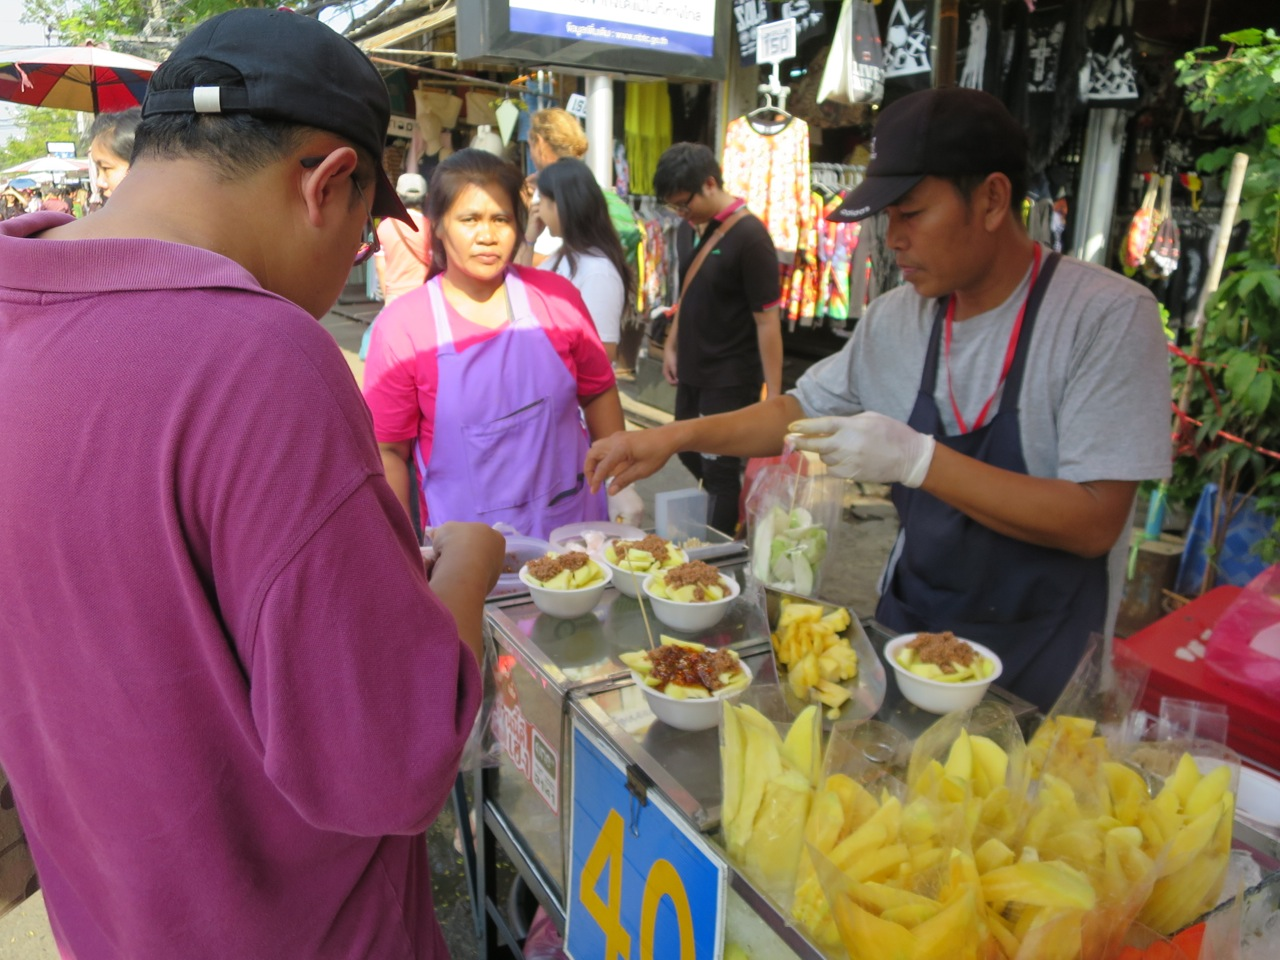 Frutas na rua - com pimenta